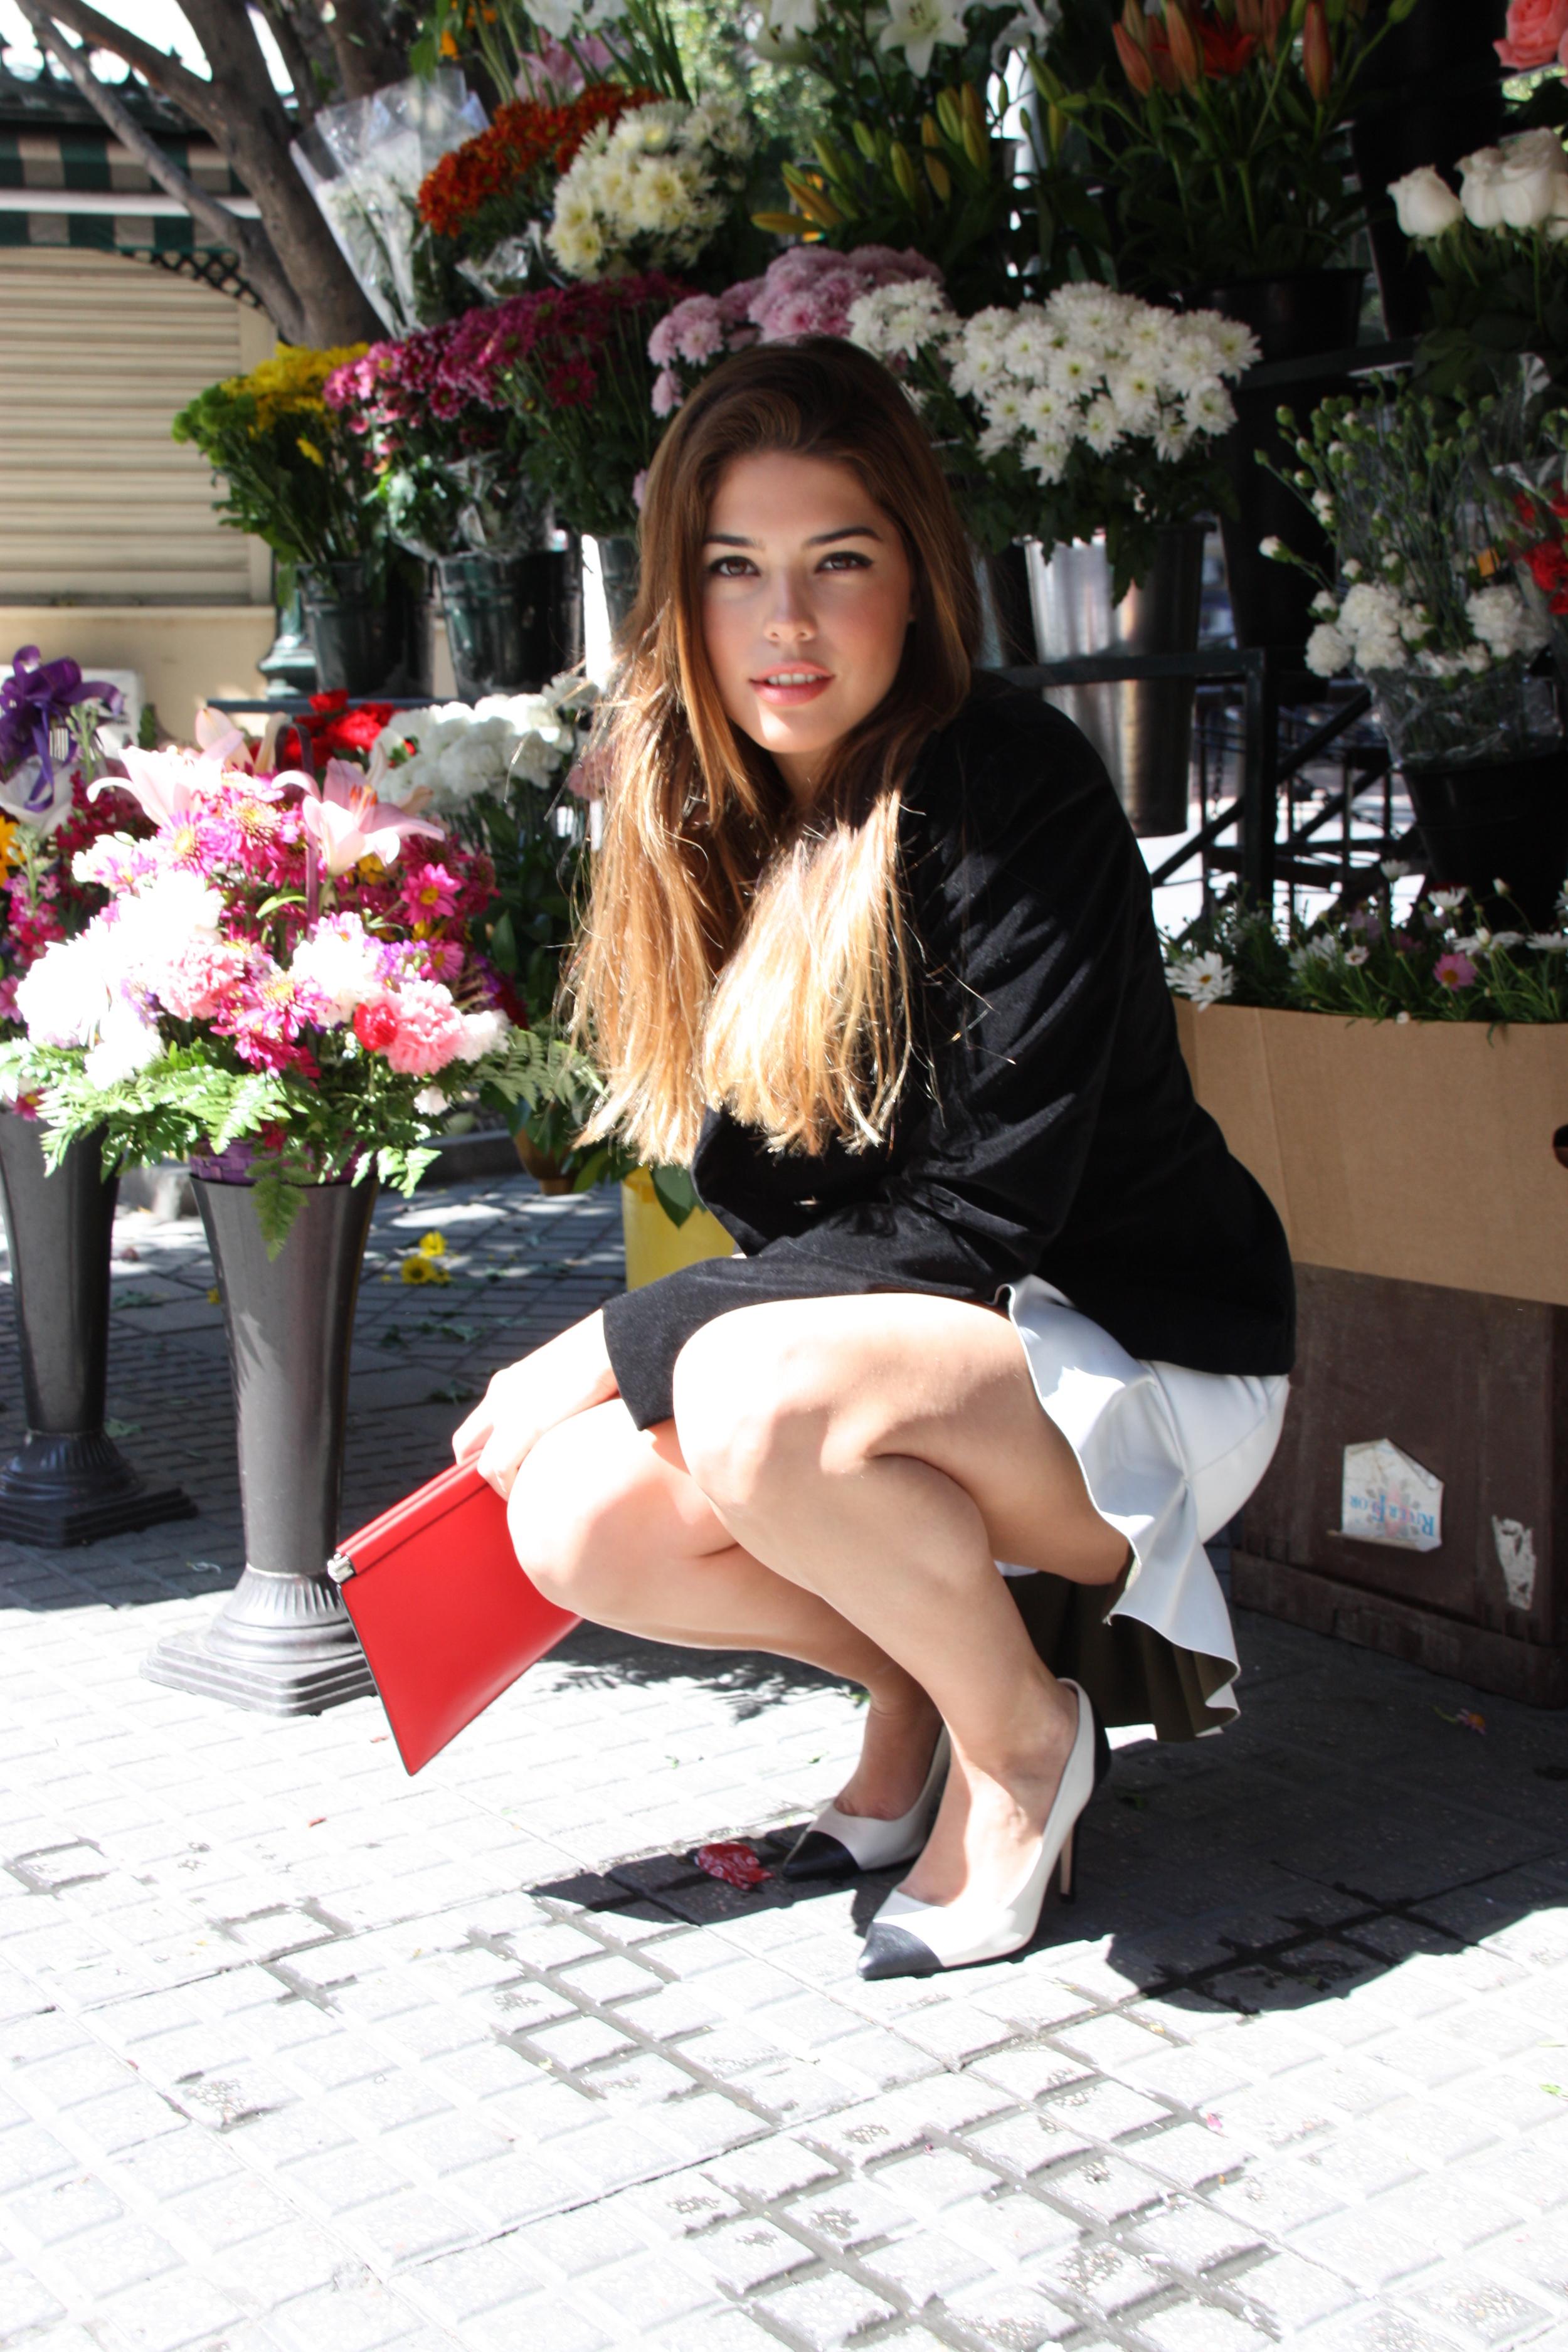 Gabriela Merino Blog Working outfit